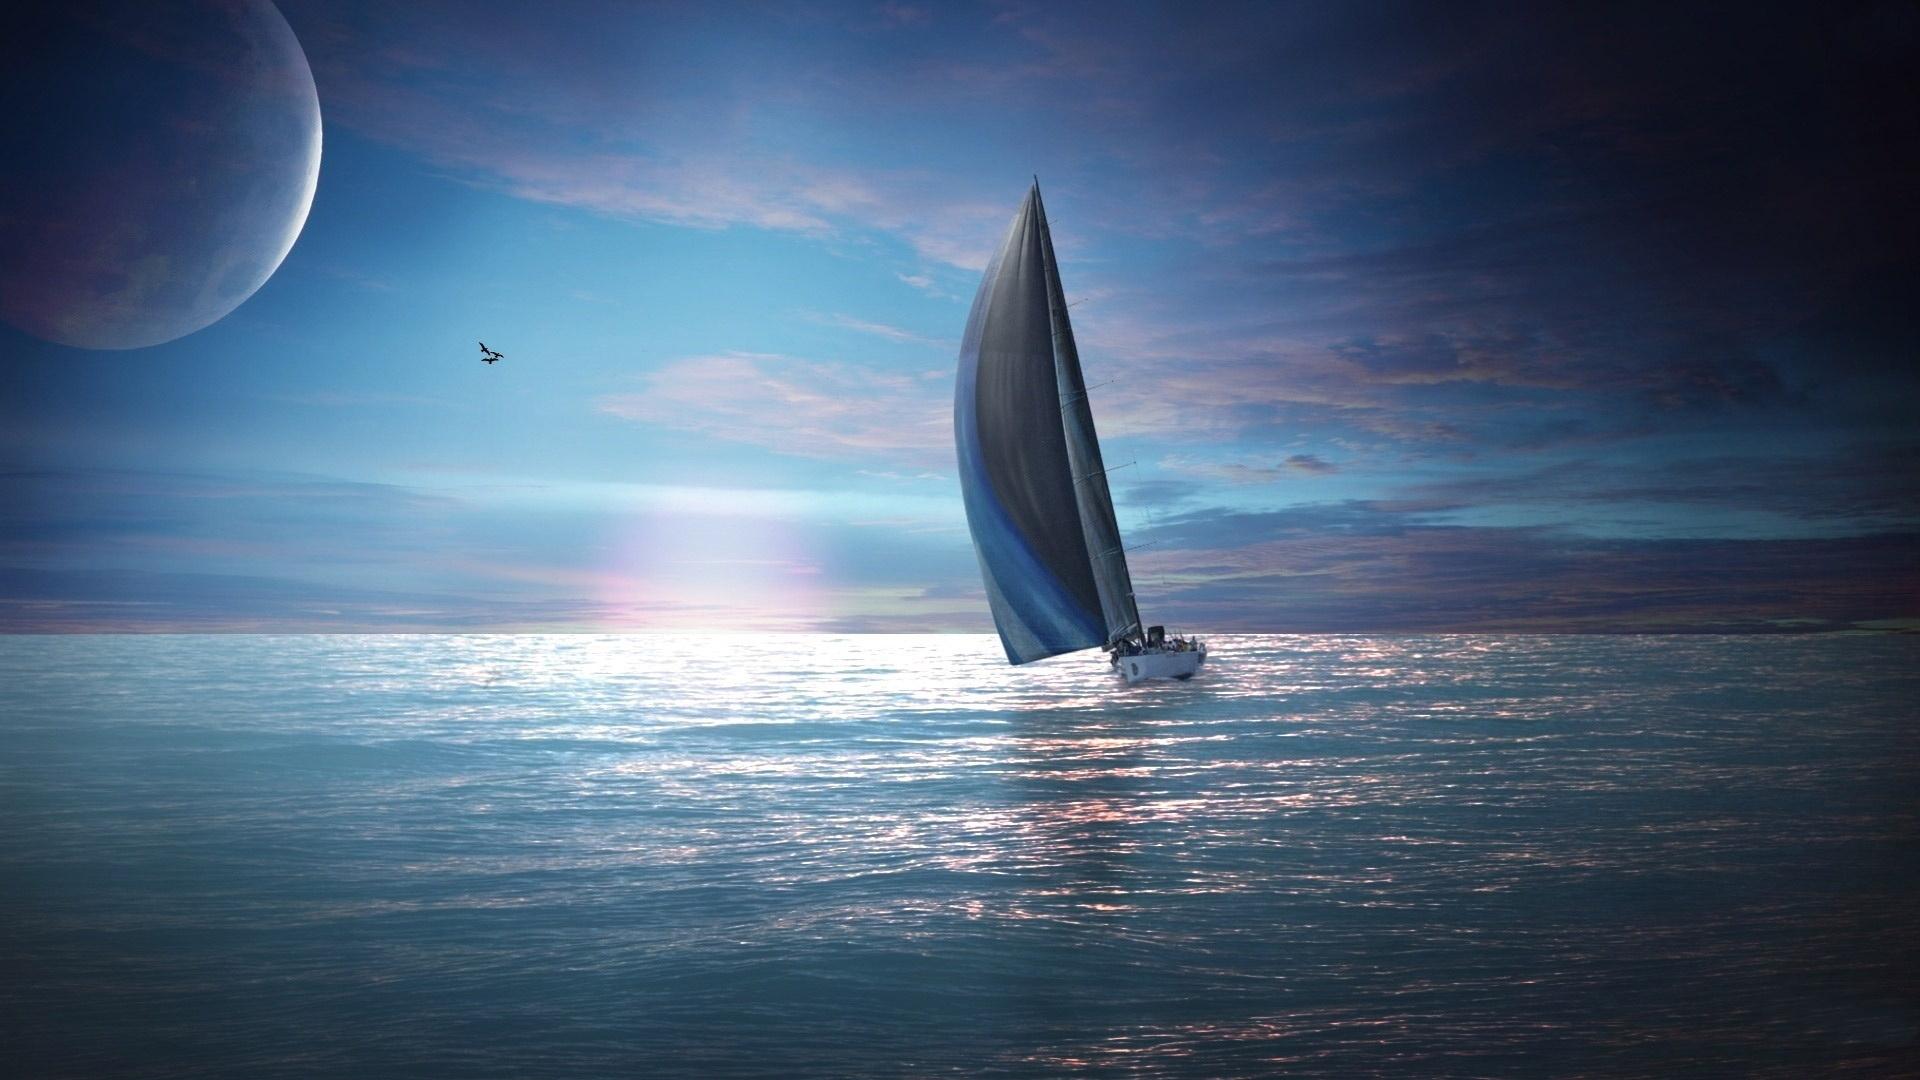 Картинка море парус